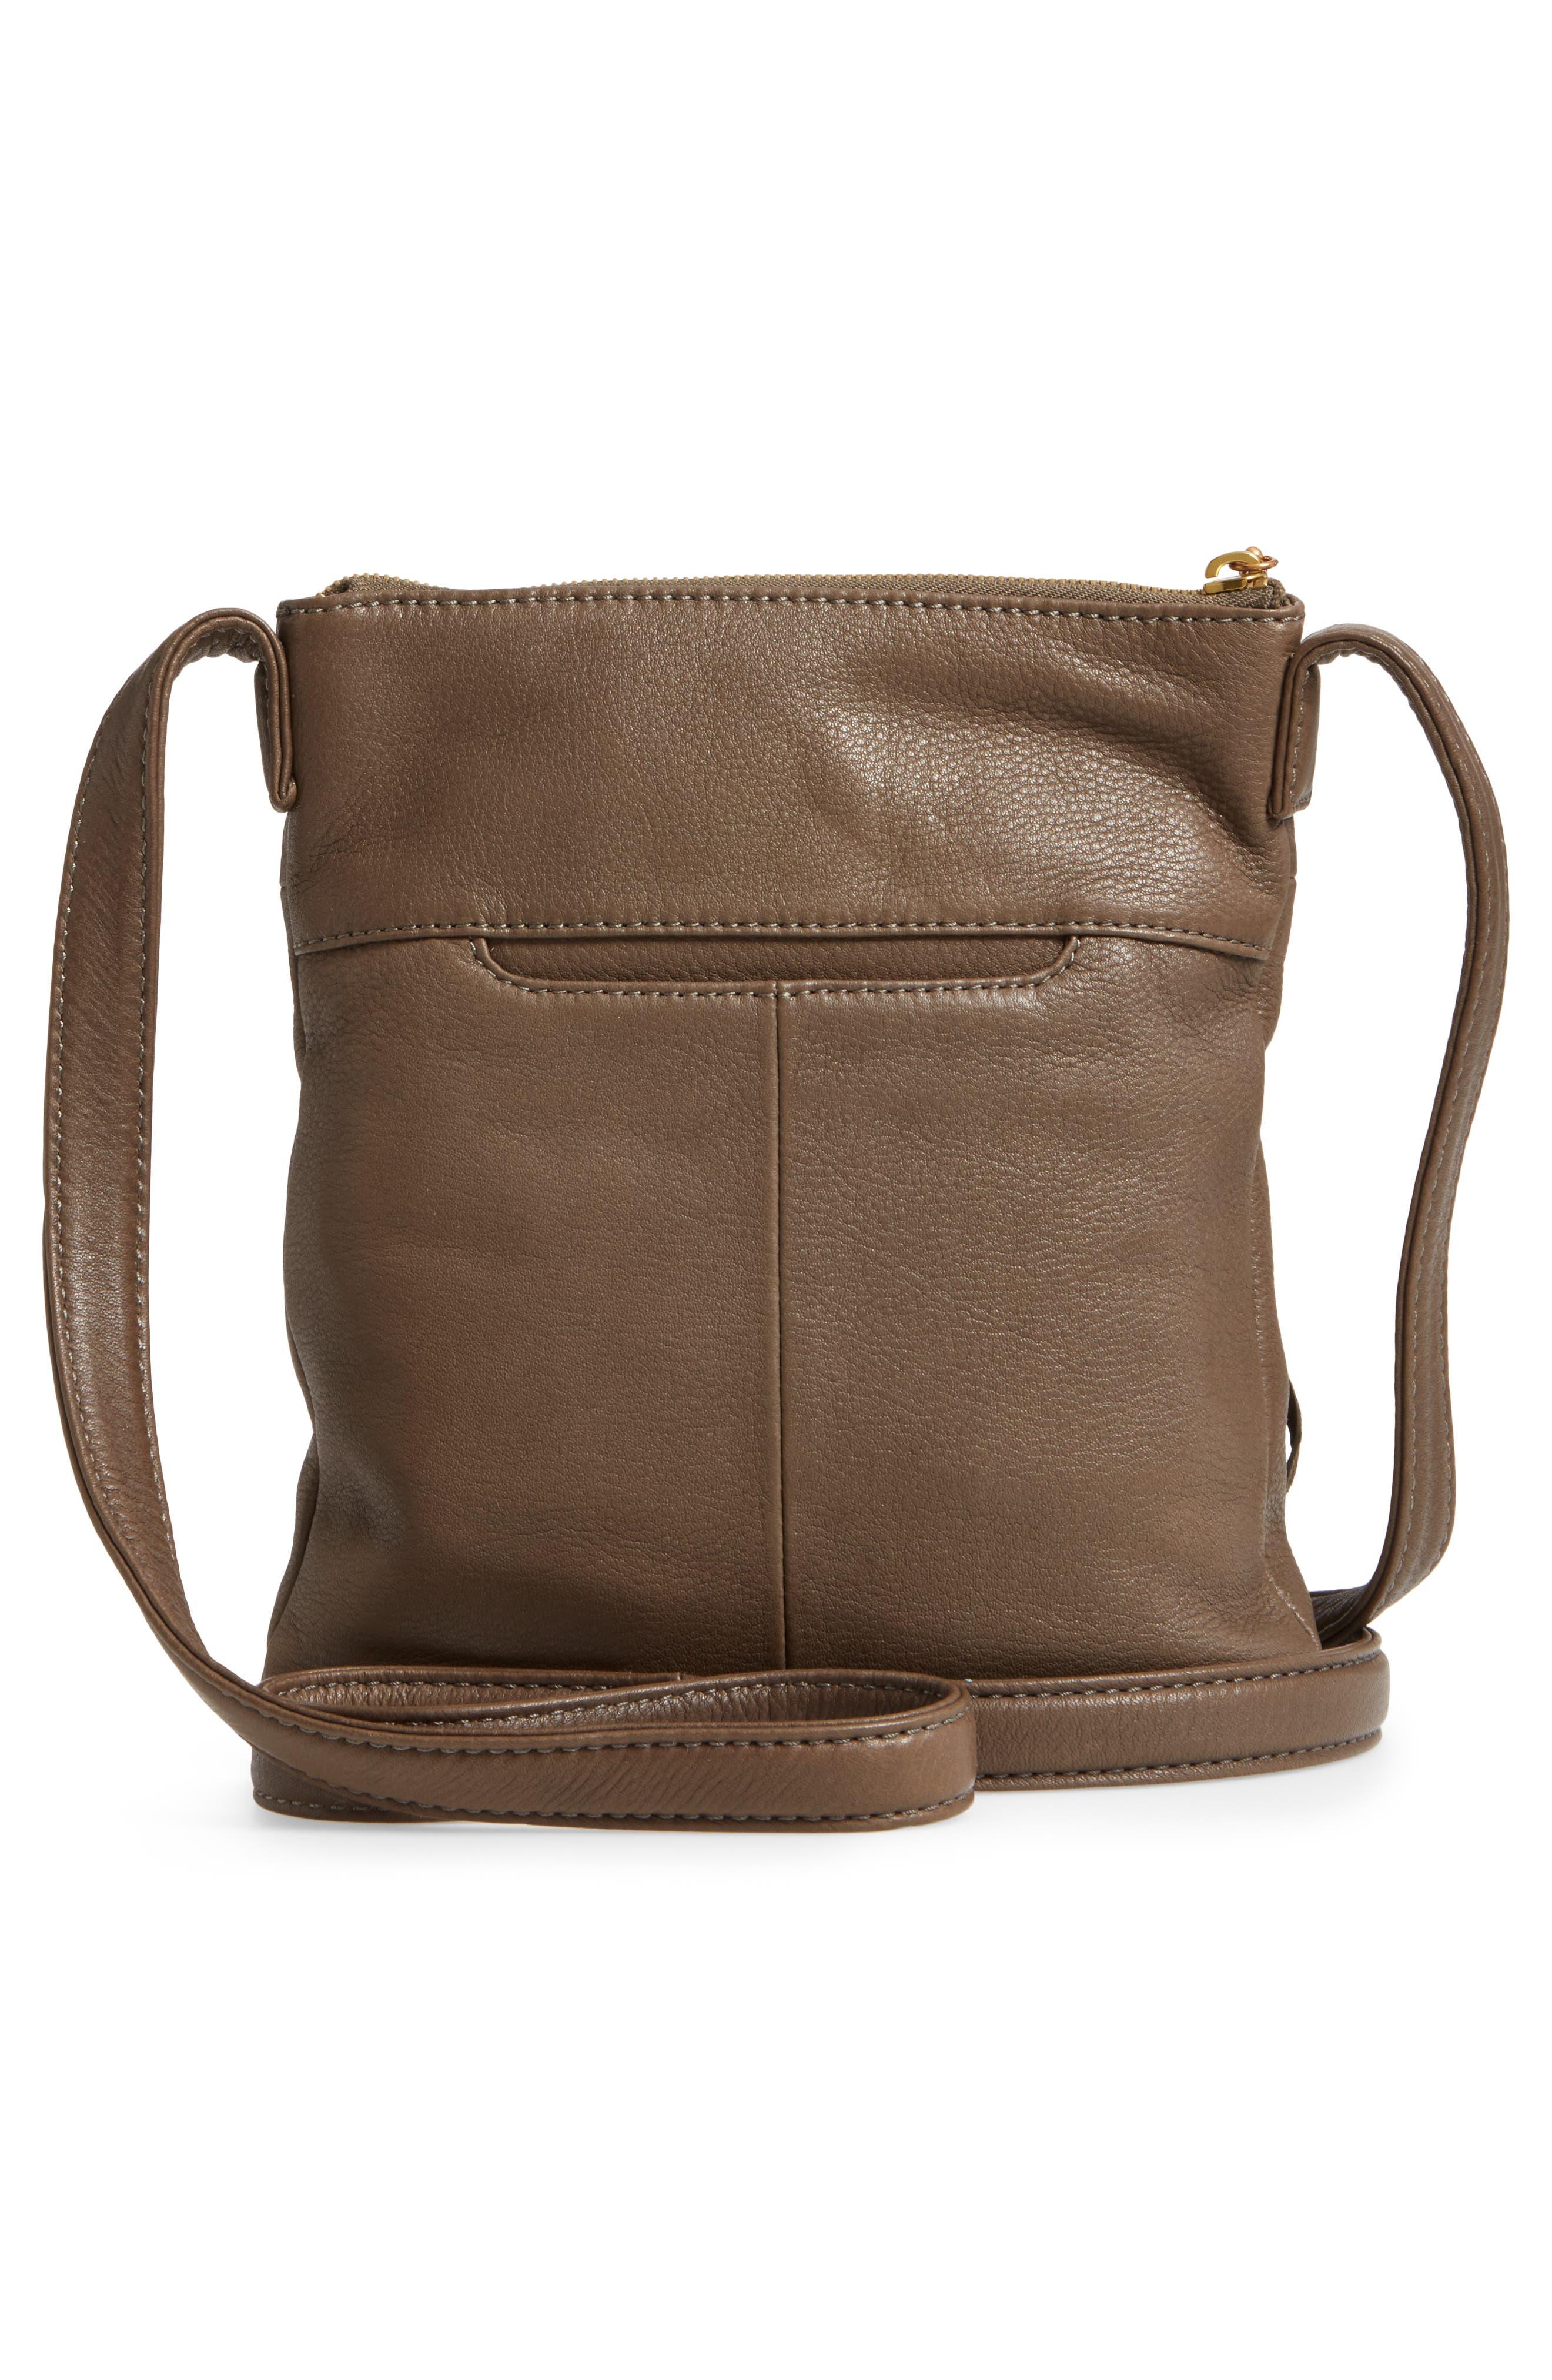 'Sarah' Leather Crossbody Bag,                             Alternate thumbnail 16, color,